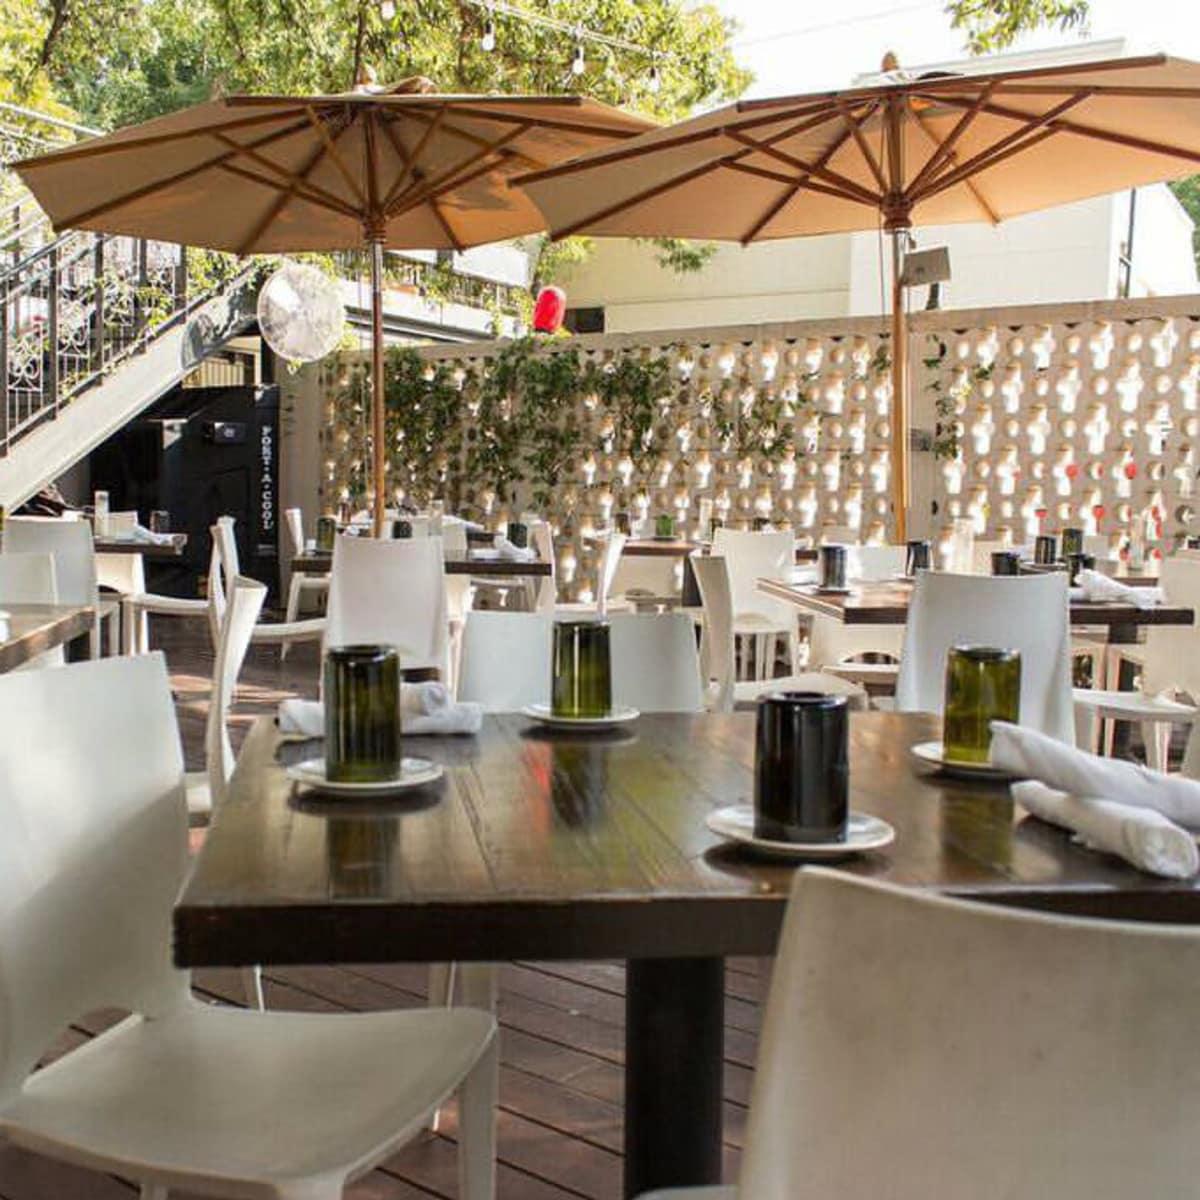 Olive & June patio